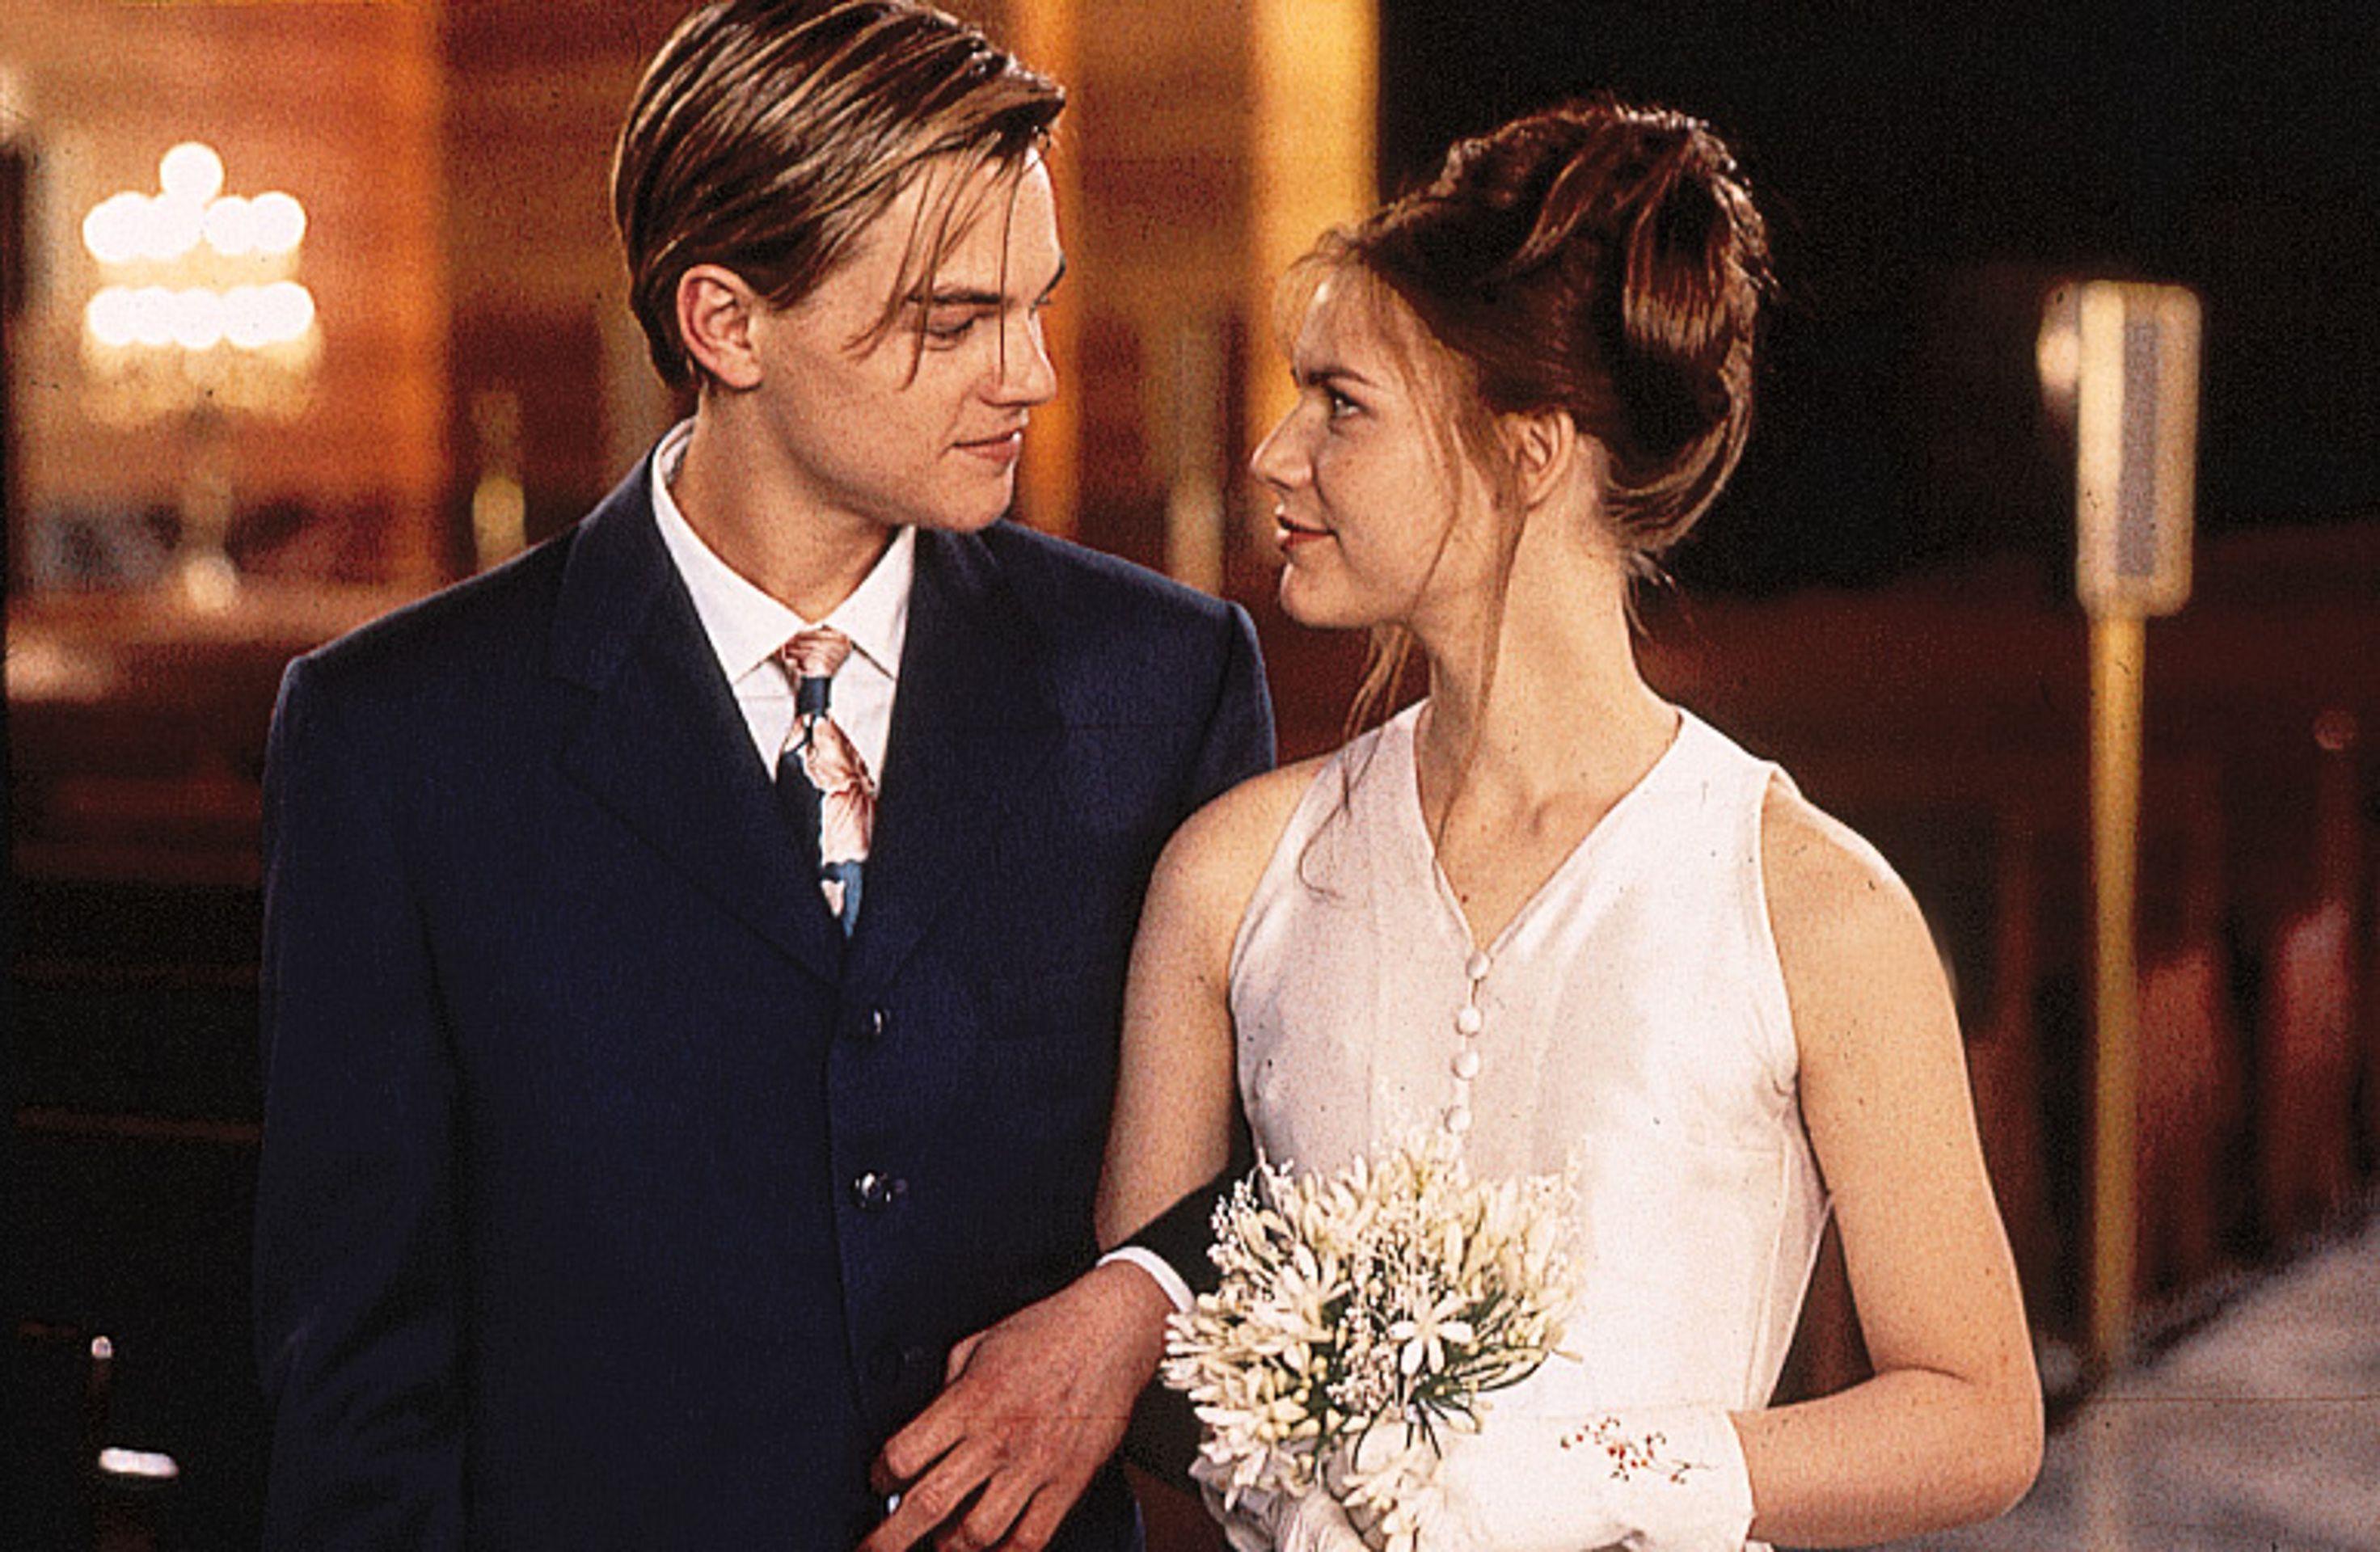 Pin By As On Filme Movie Wedding Dresses Wedding Movies Tv Weddings